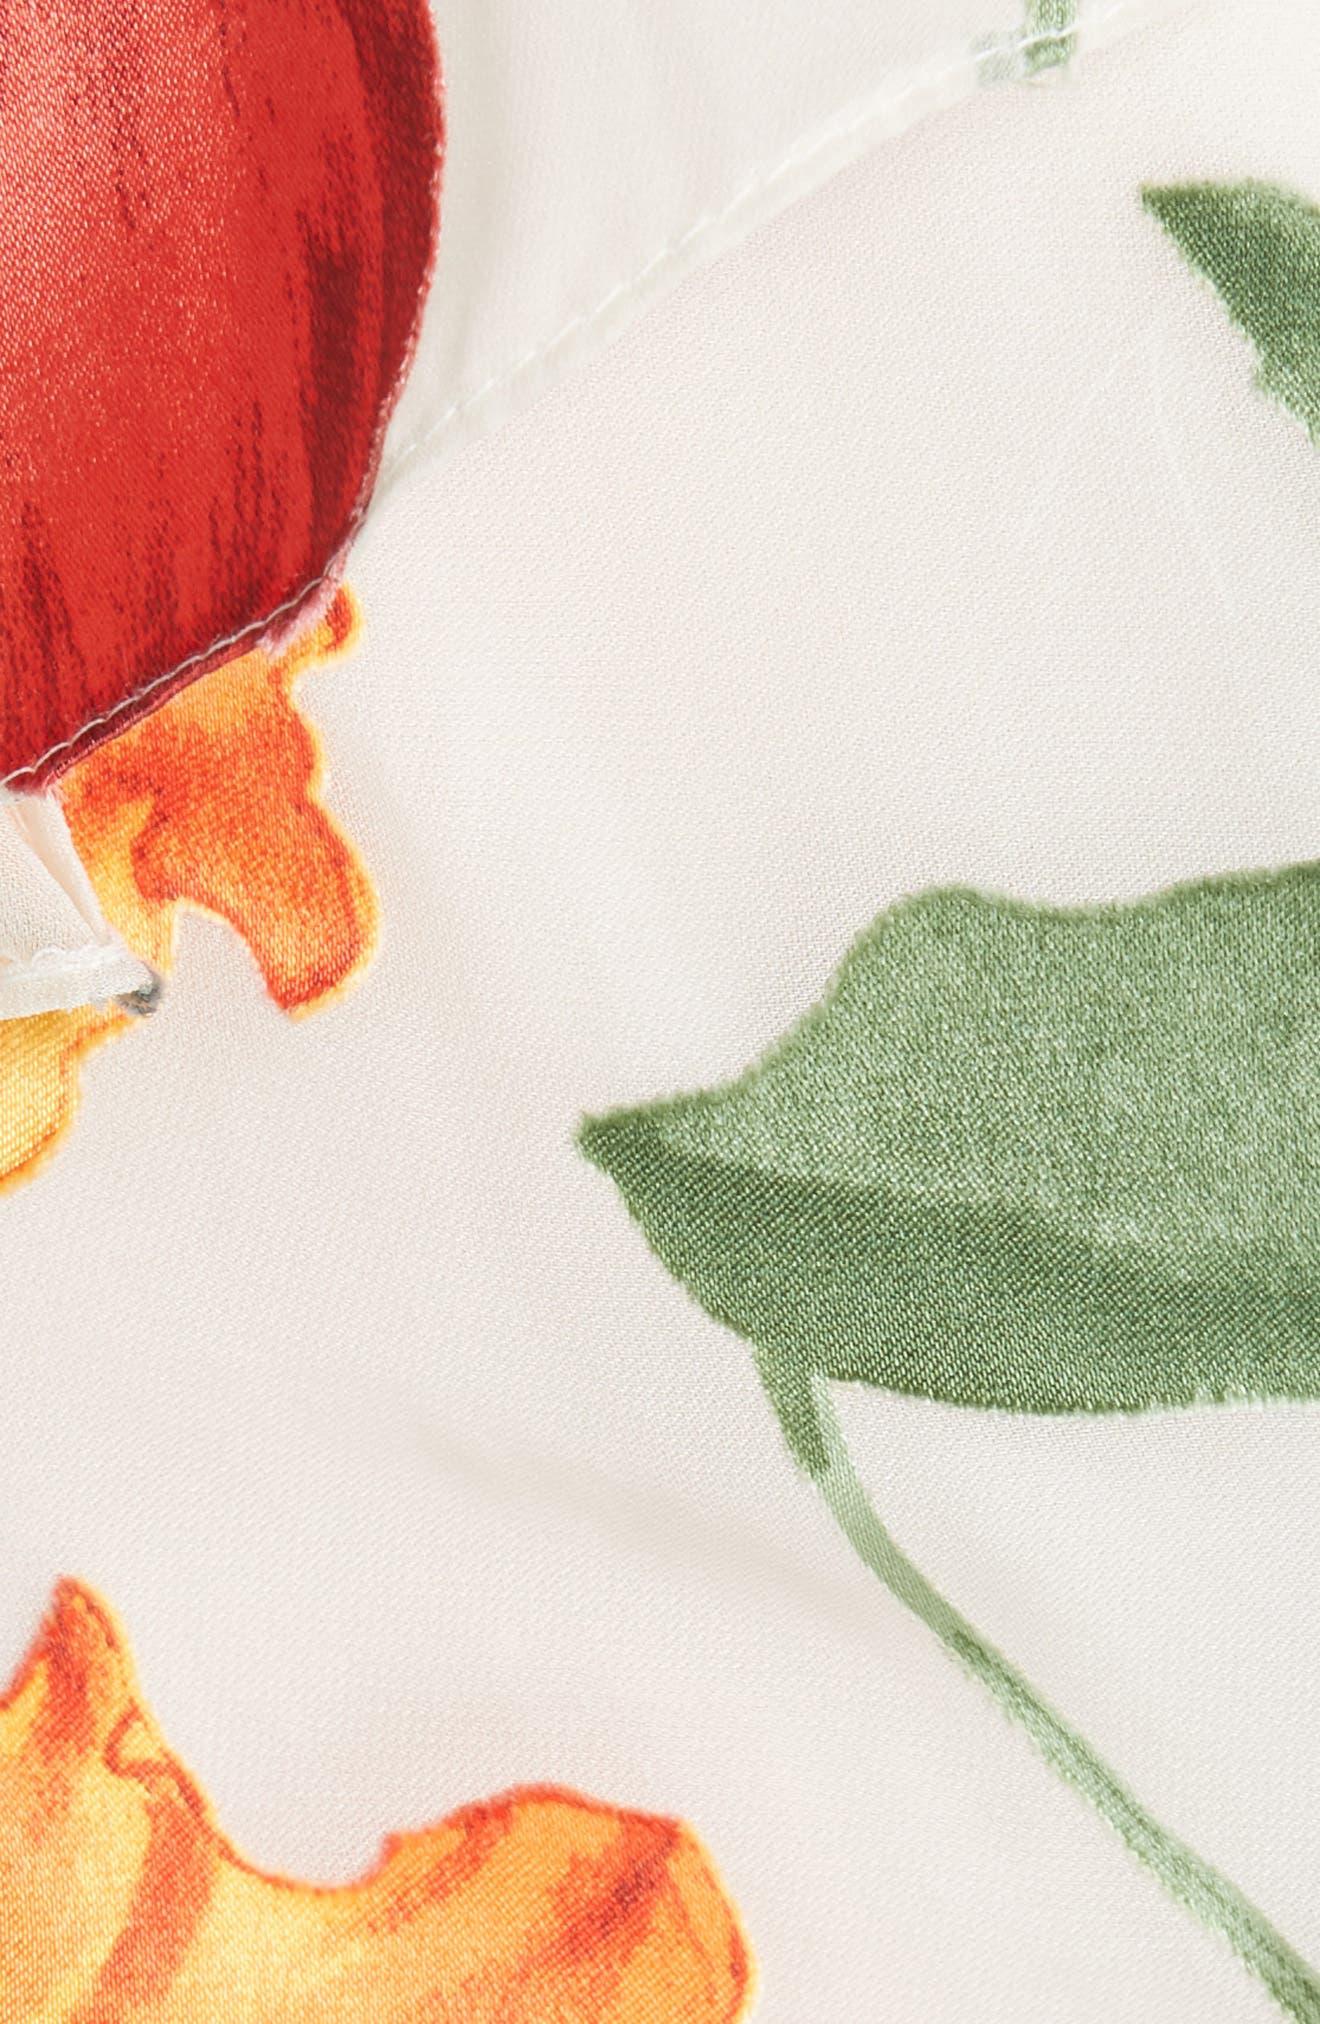 Nicole Ruffle Wrap Top,                             Alternate thumbnail 5, color,                             Greenwich Garden Soft Cream